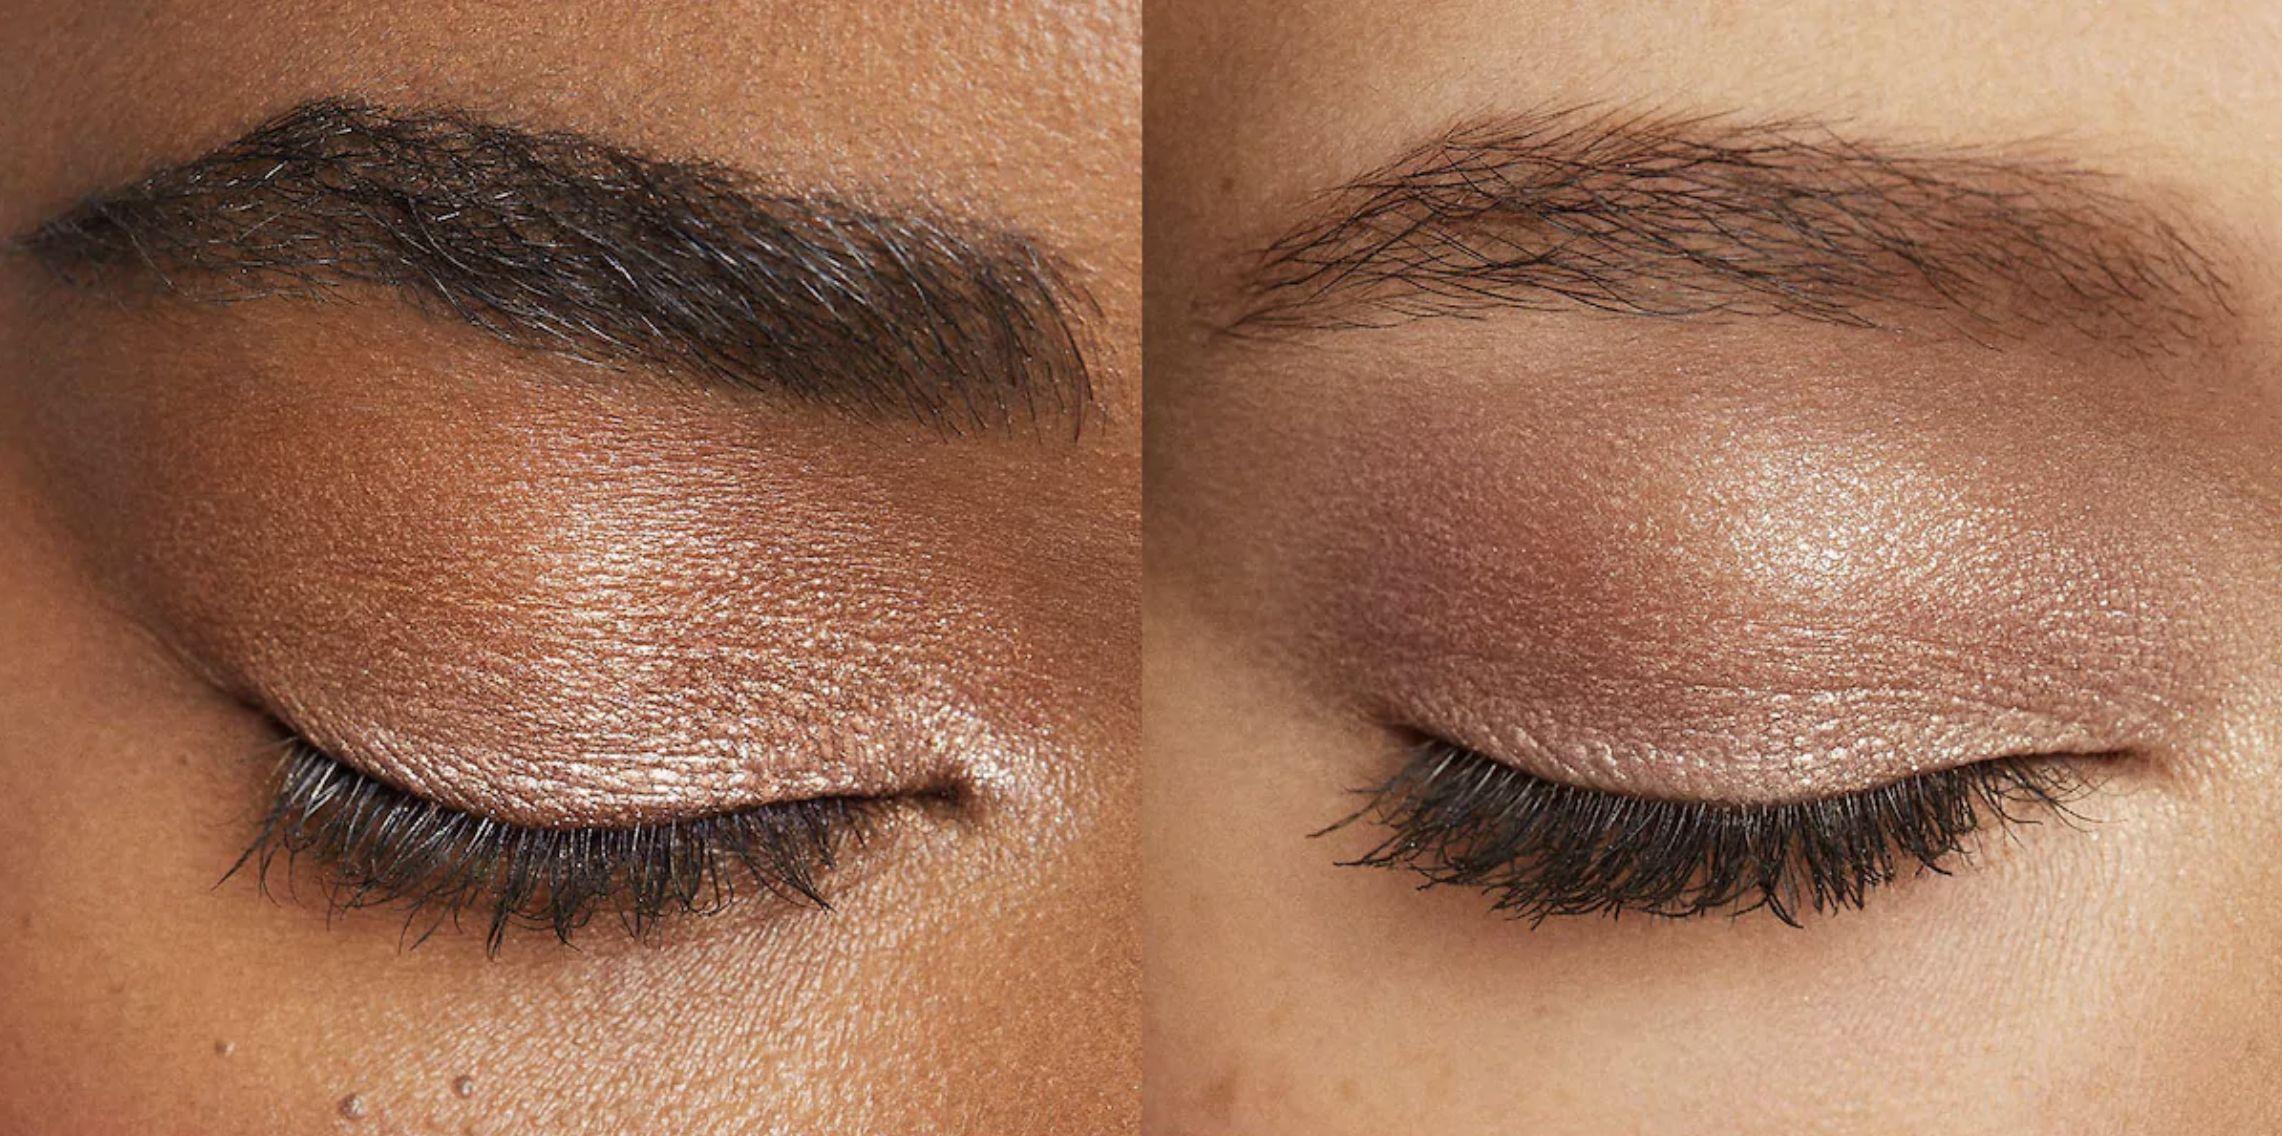 Laura Mercier's eyeshadow sticks are great for minimal makeup wearers